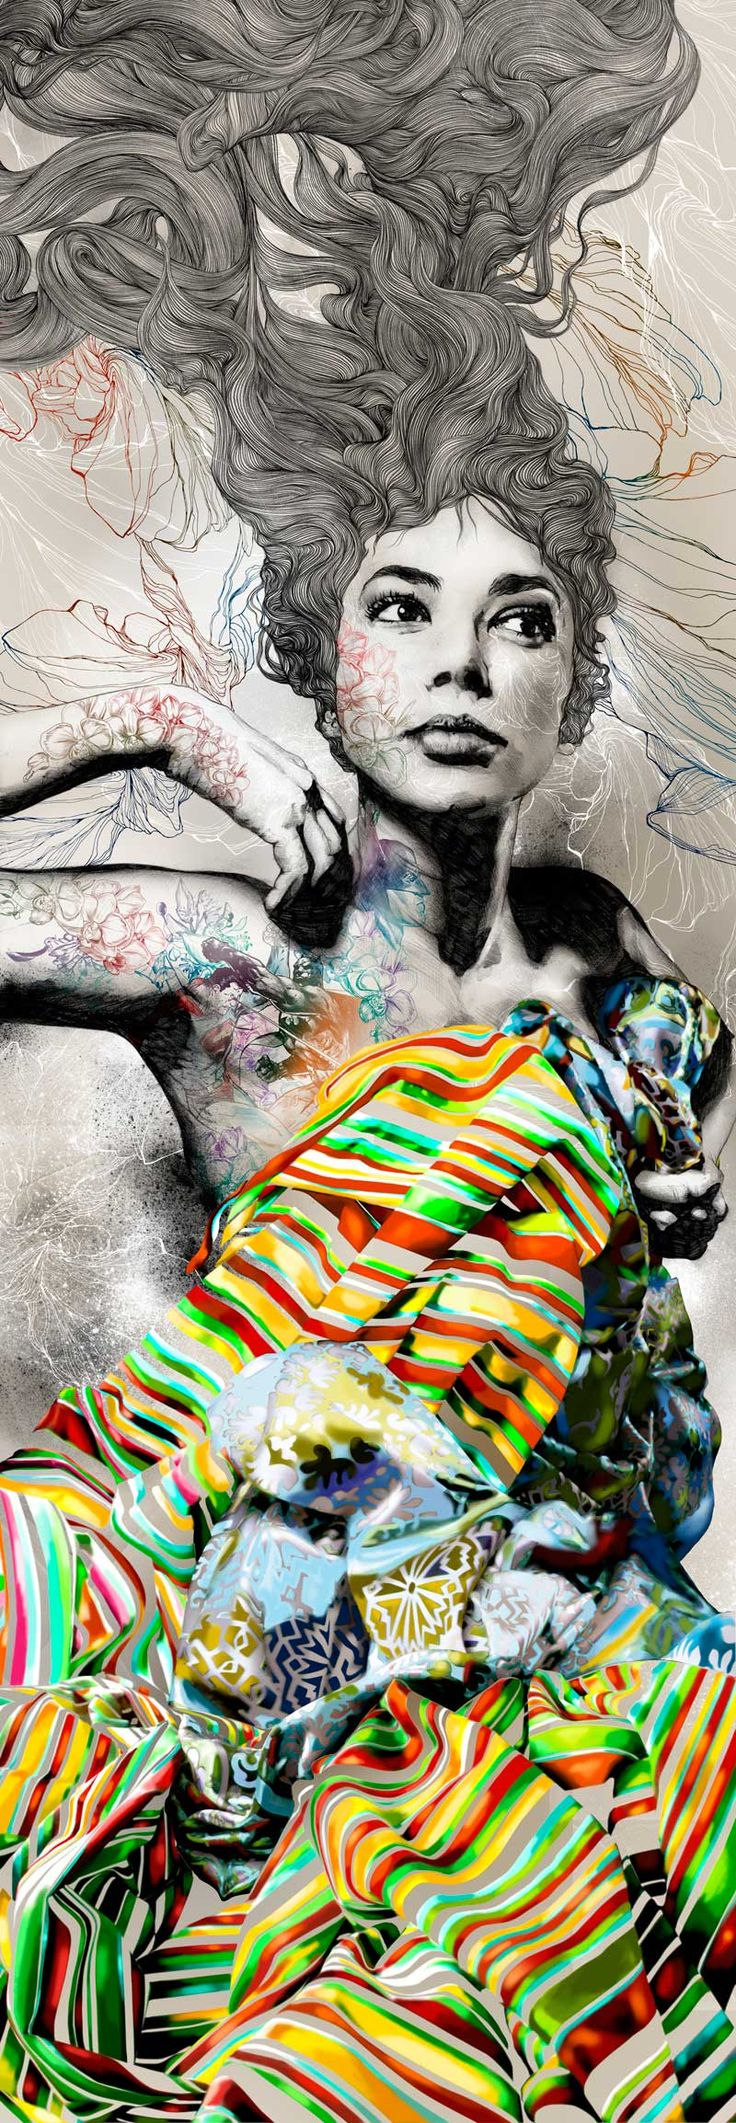 .Toya's Tales Art of the Day - Gabriel Moreno